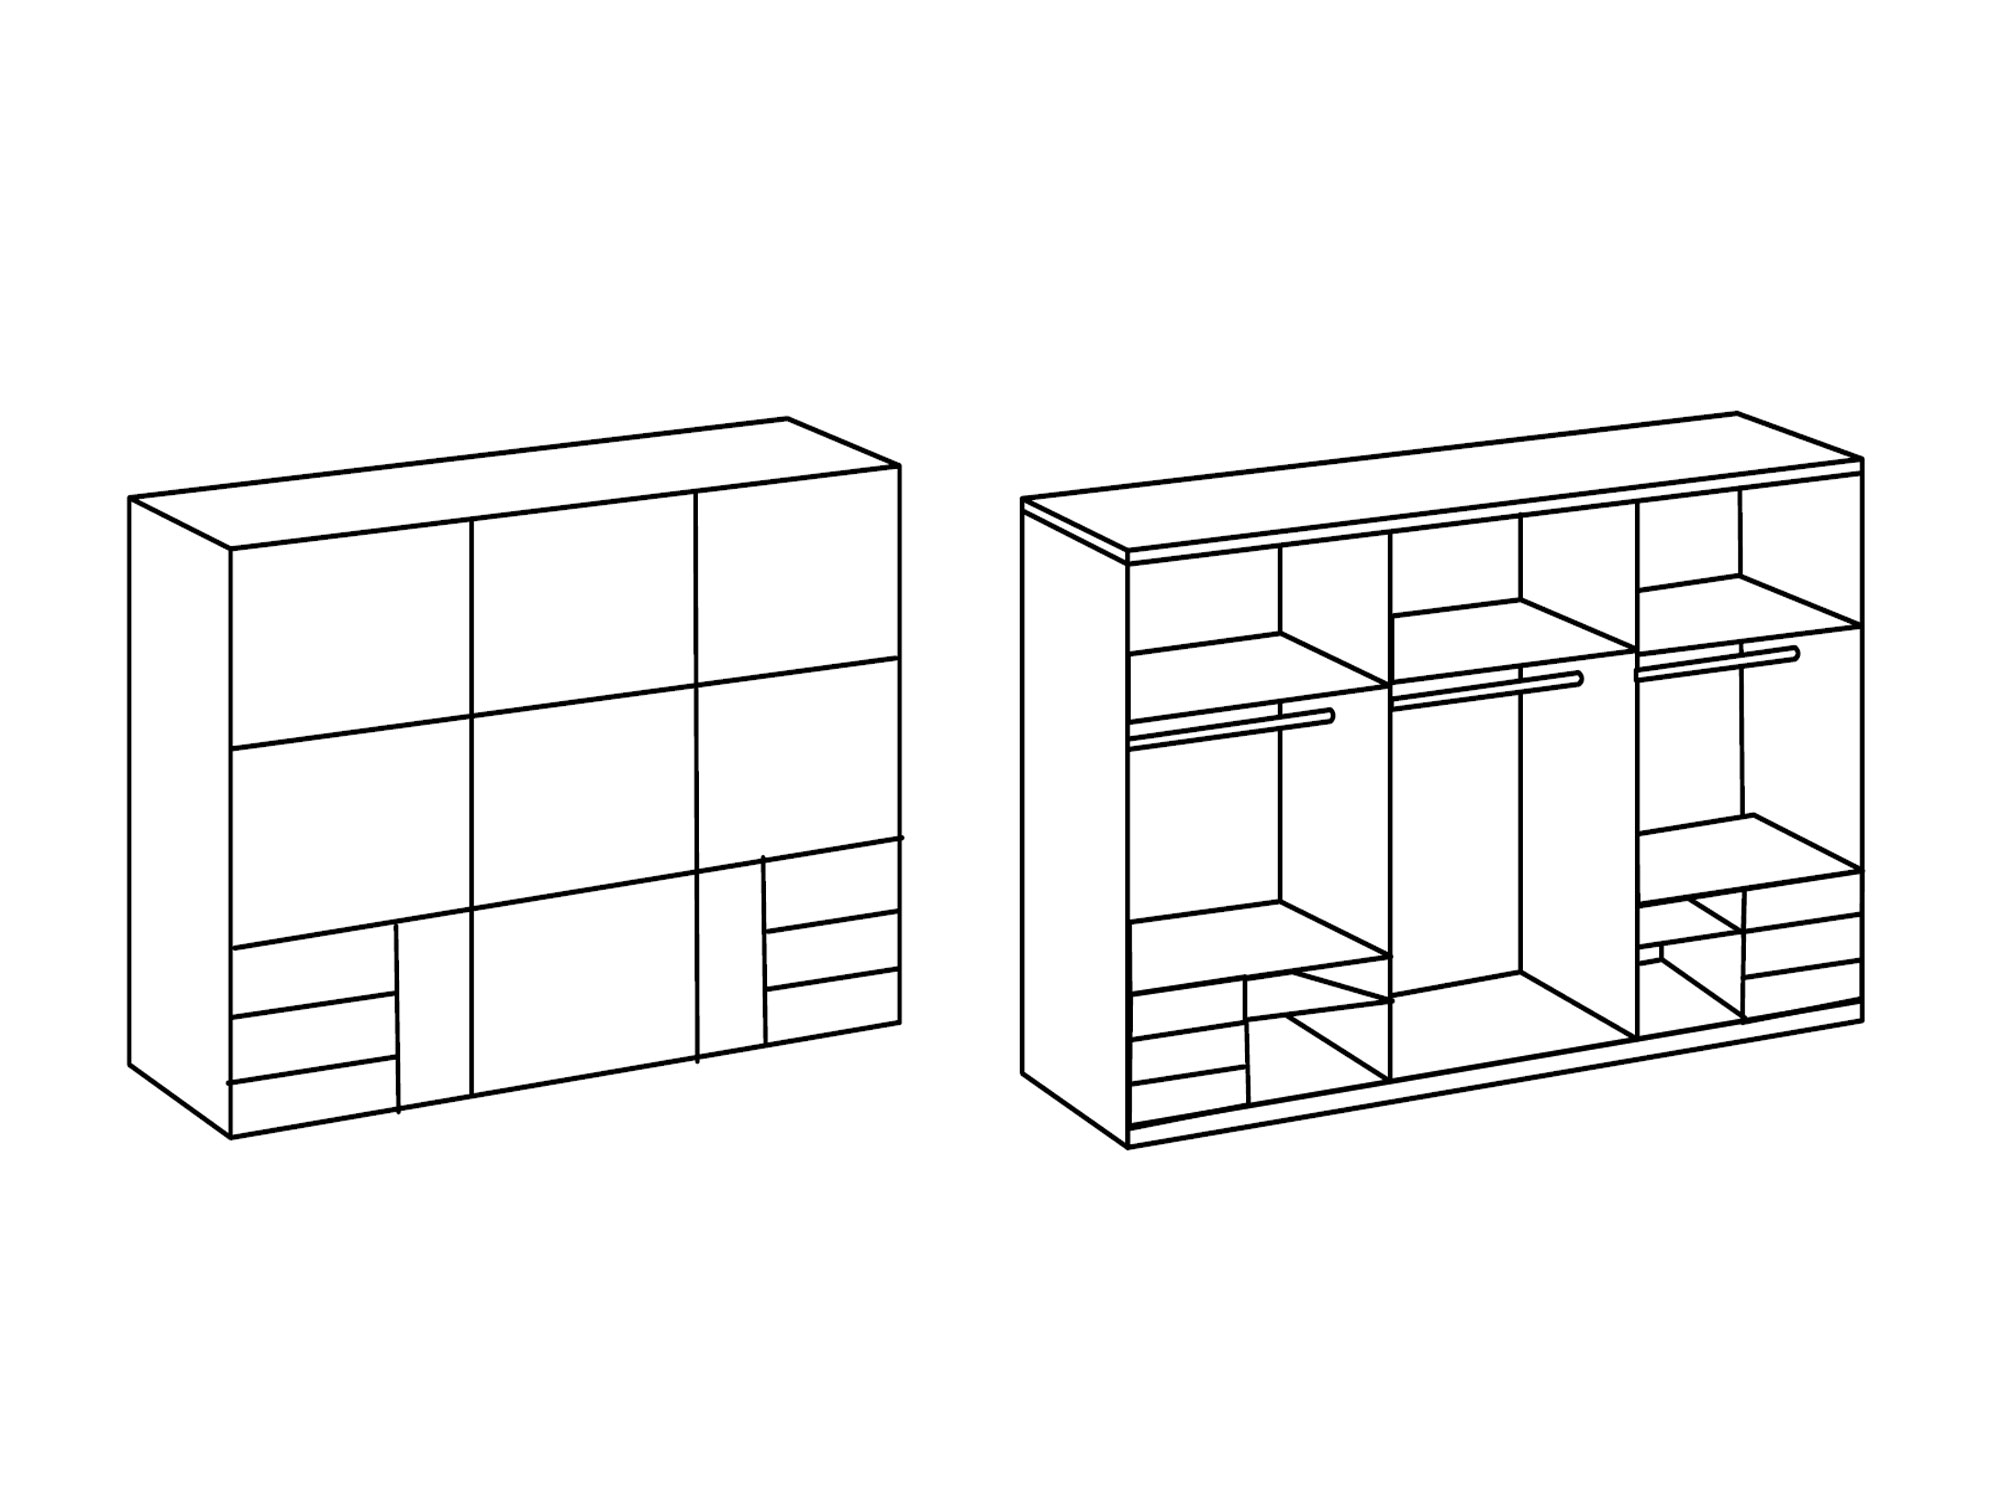 lakota schwebet renschrank weiss plankeneiche 300 cm. Black Bedroom Furniture Sets. Home Design Ideas